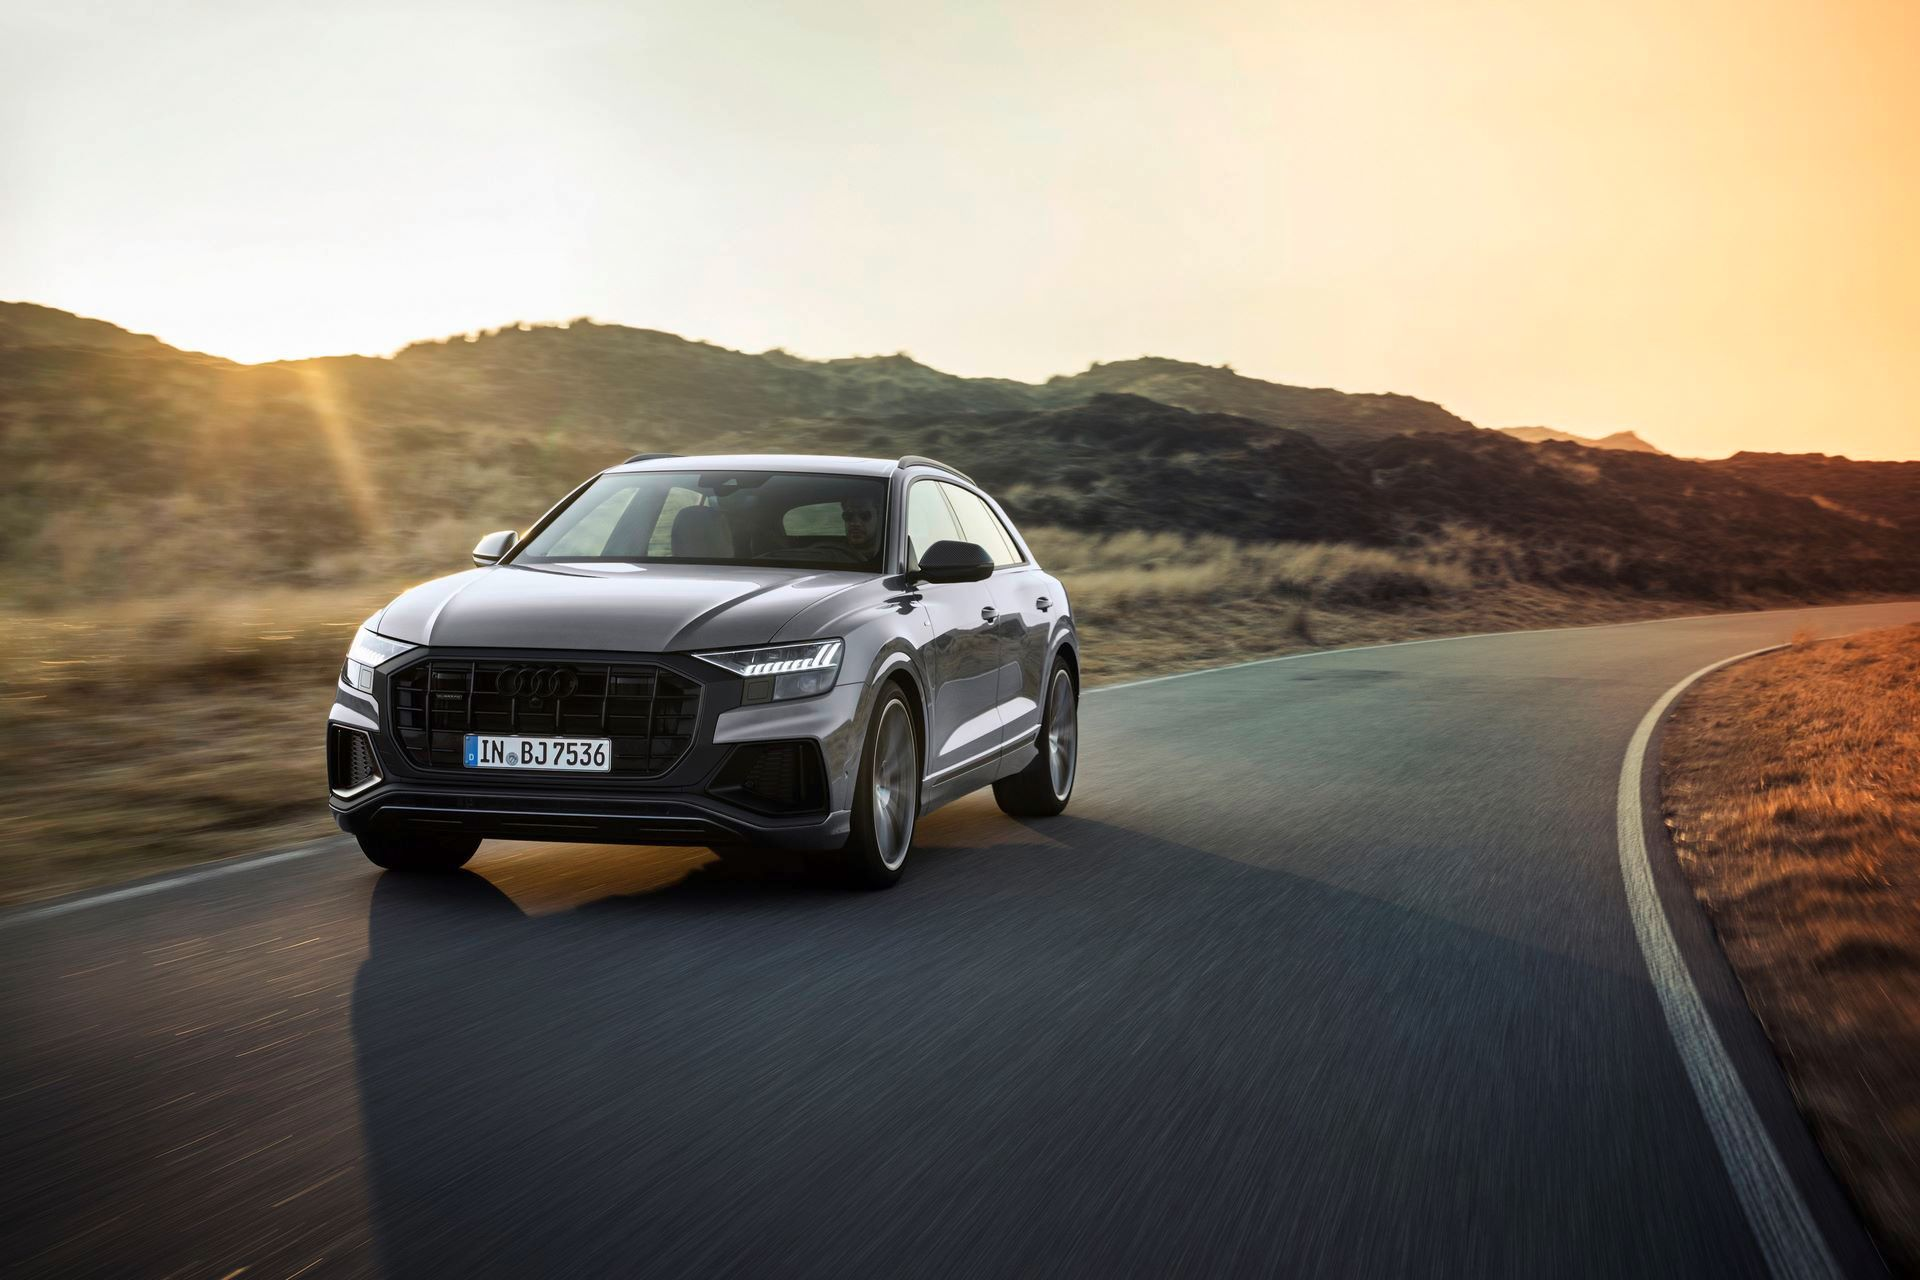 Audi-A4-A5-Q7-Q8-Competition-And-Competition-Plus-Trims-25